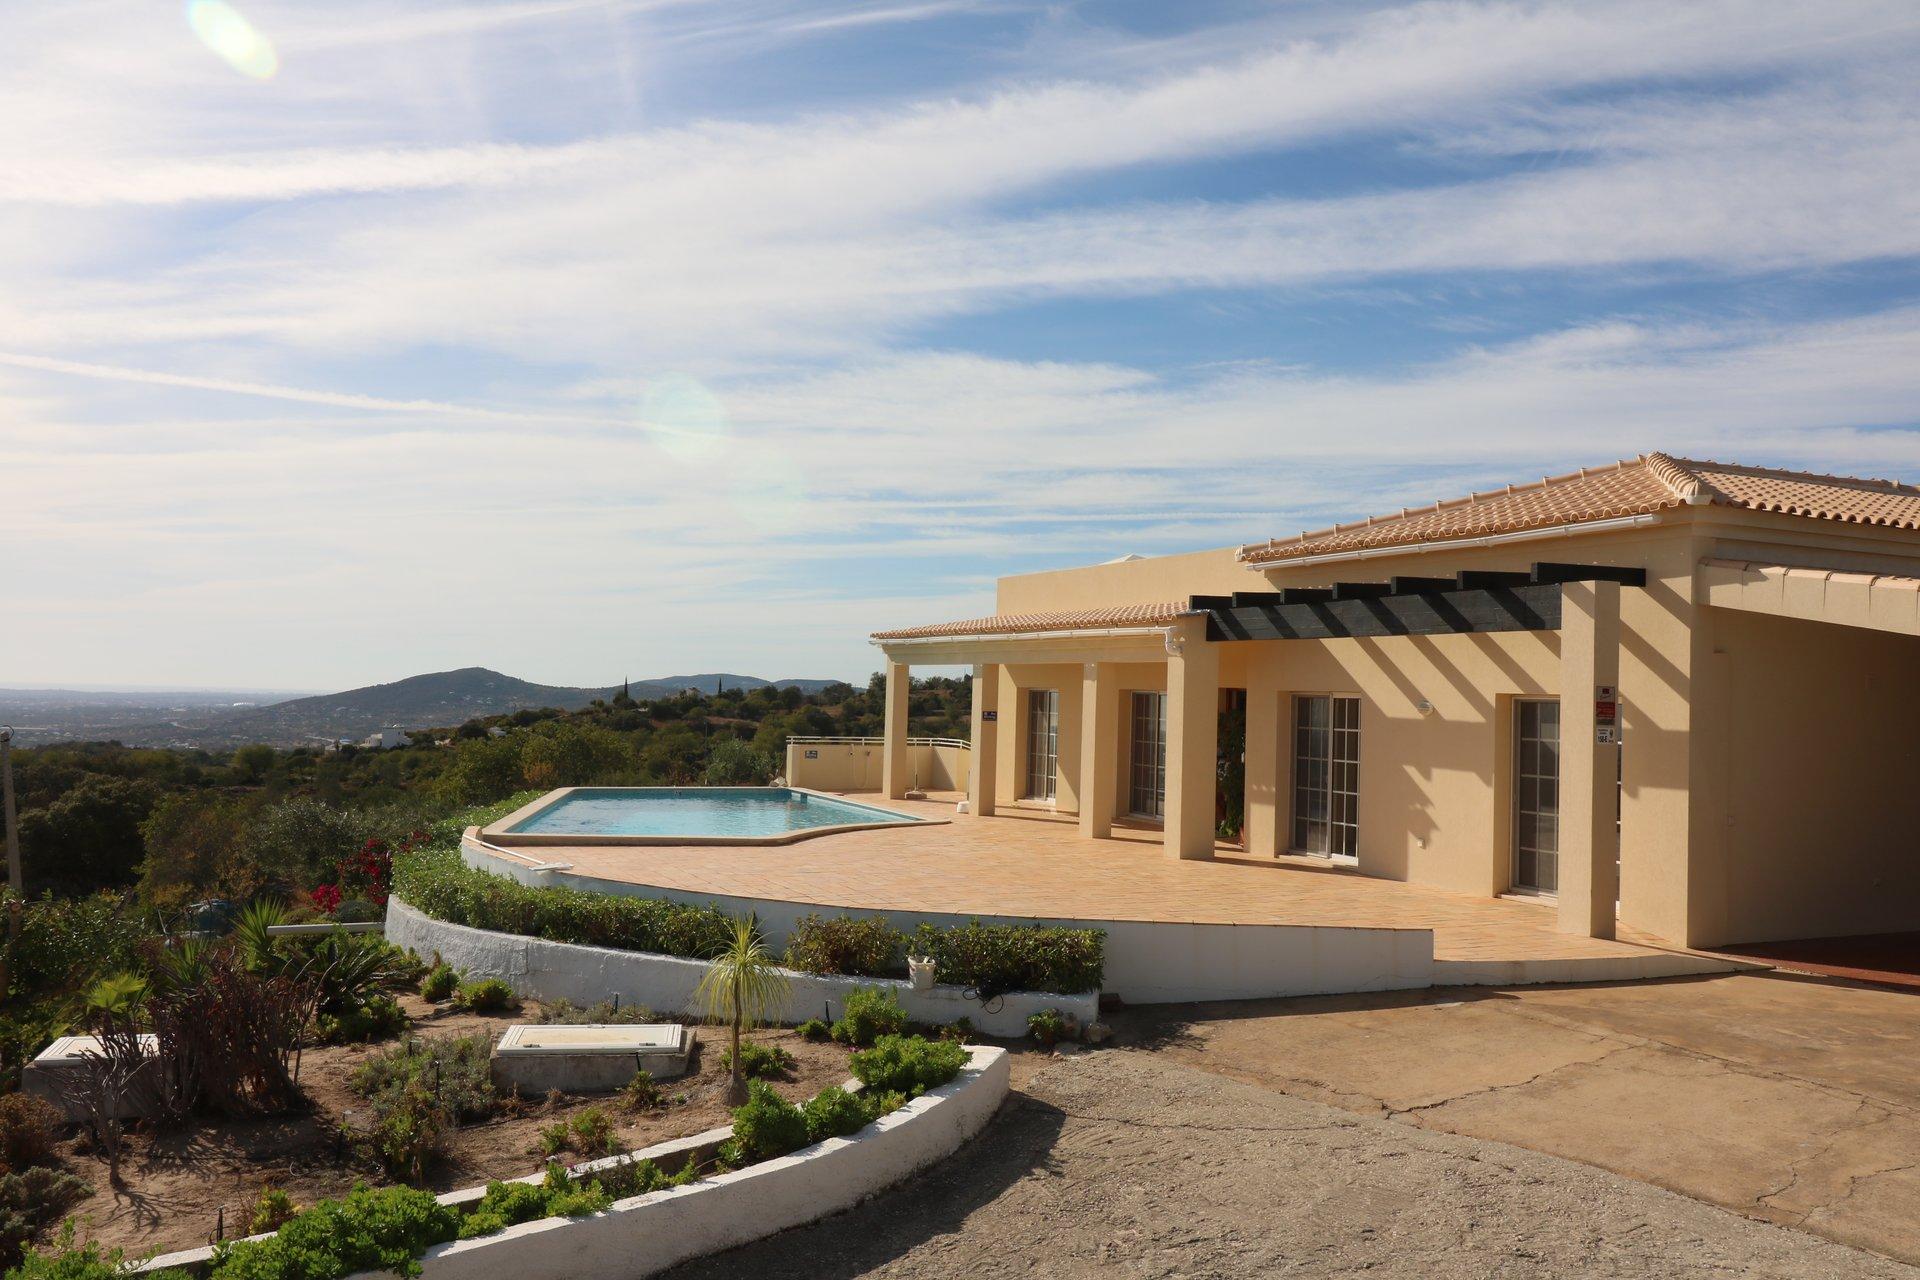 3 Bedroom Villa Estoi, Central Algarve Ref: JV10387